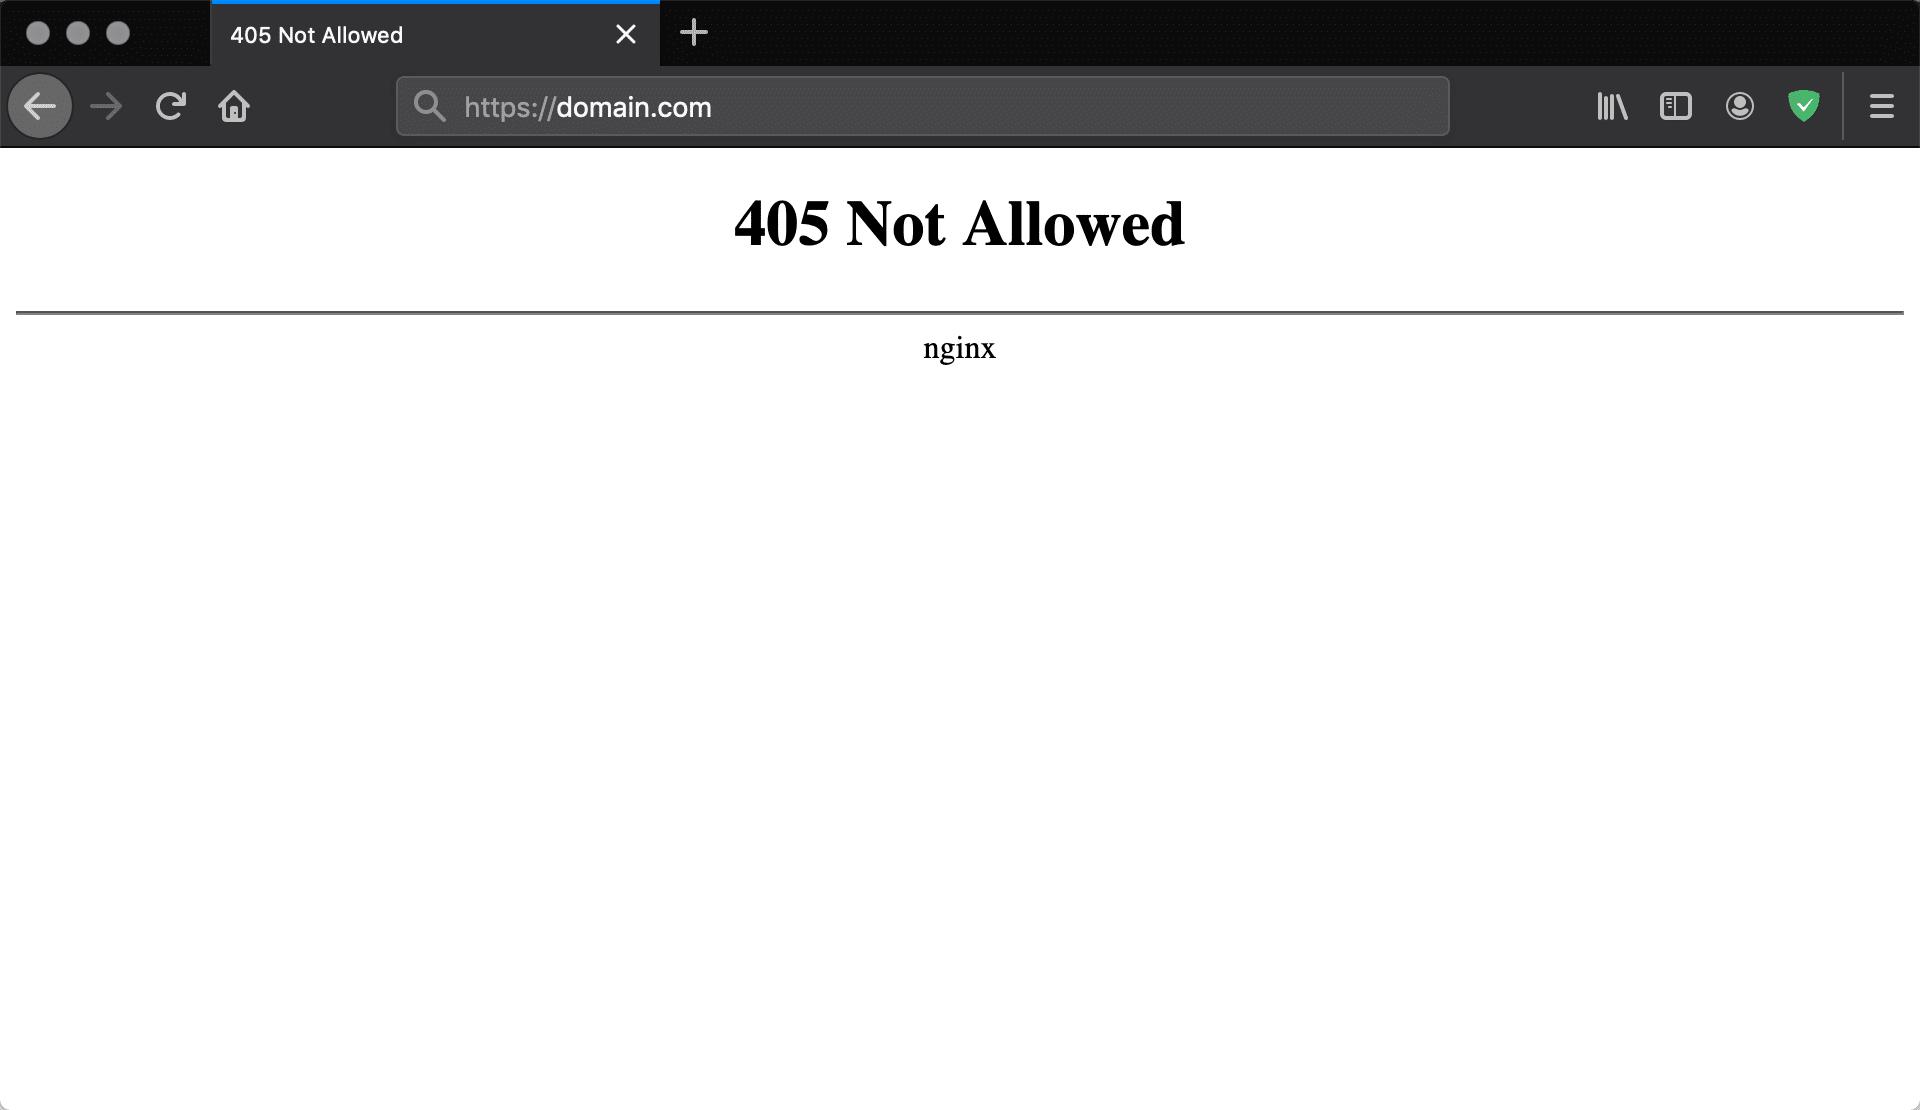 405 Not Allowed Error Nginx in Firefox